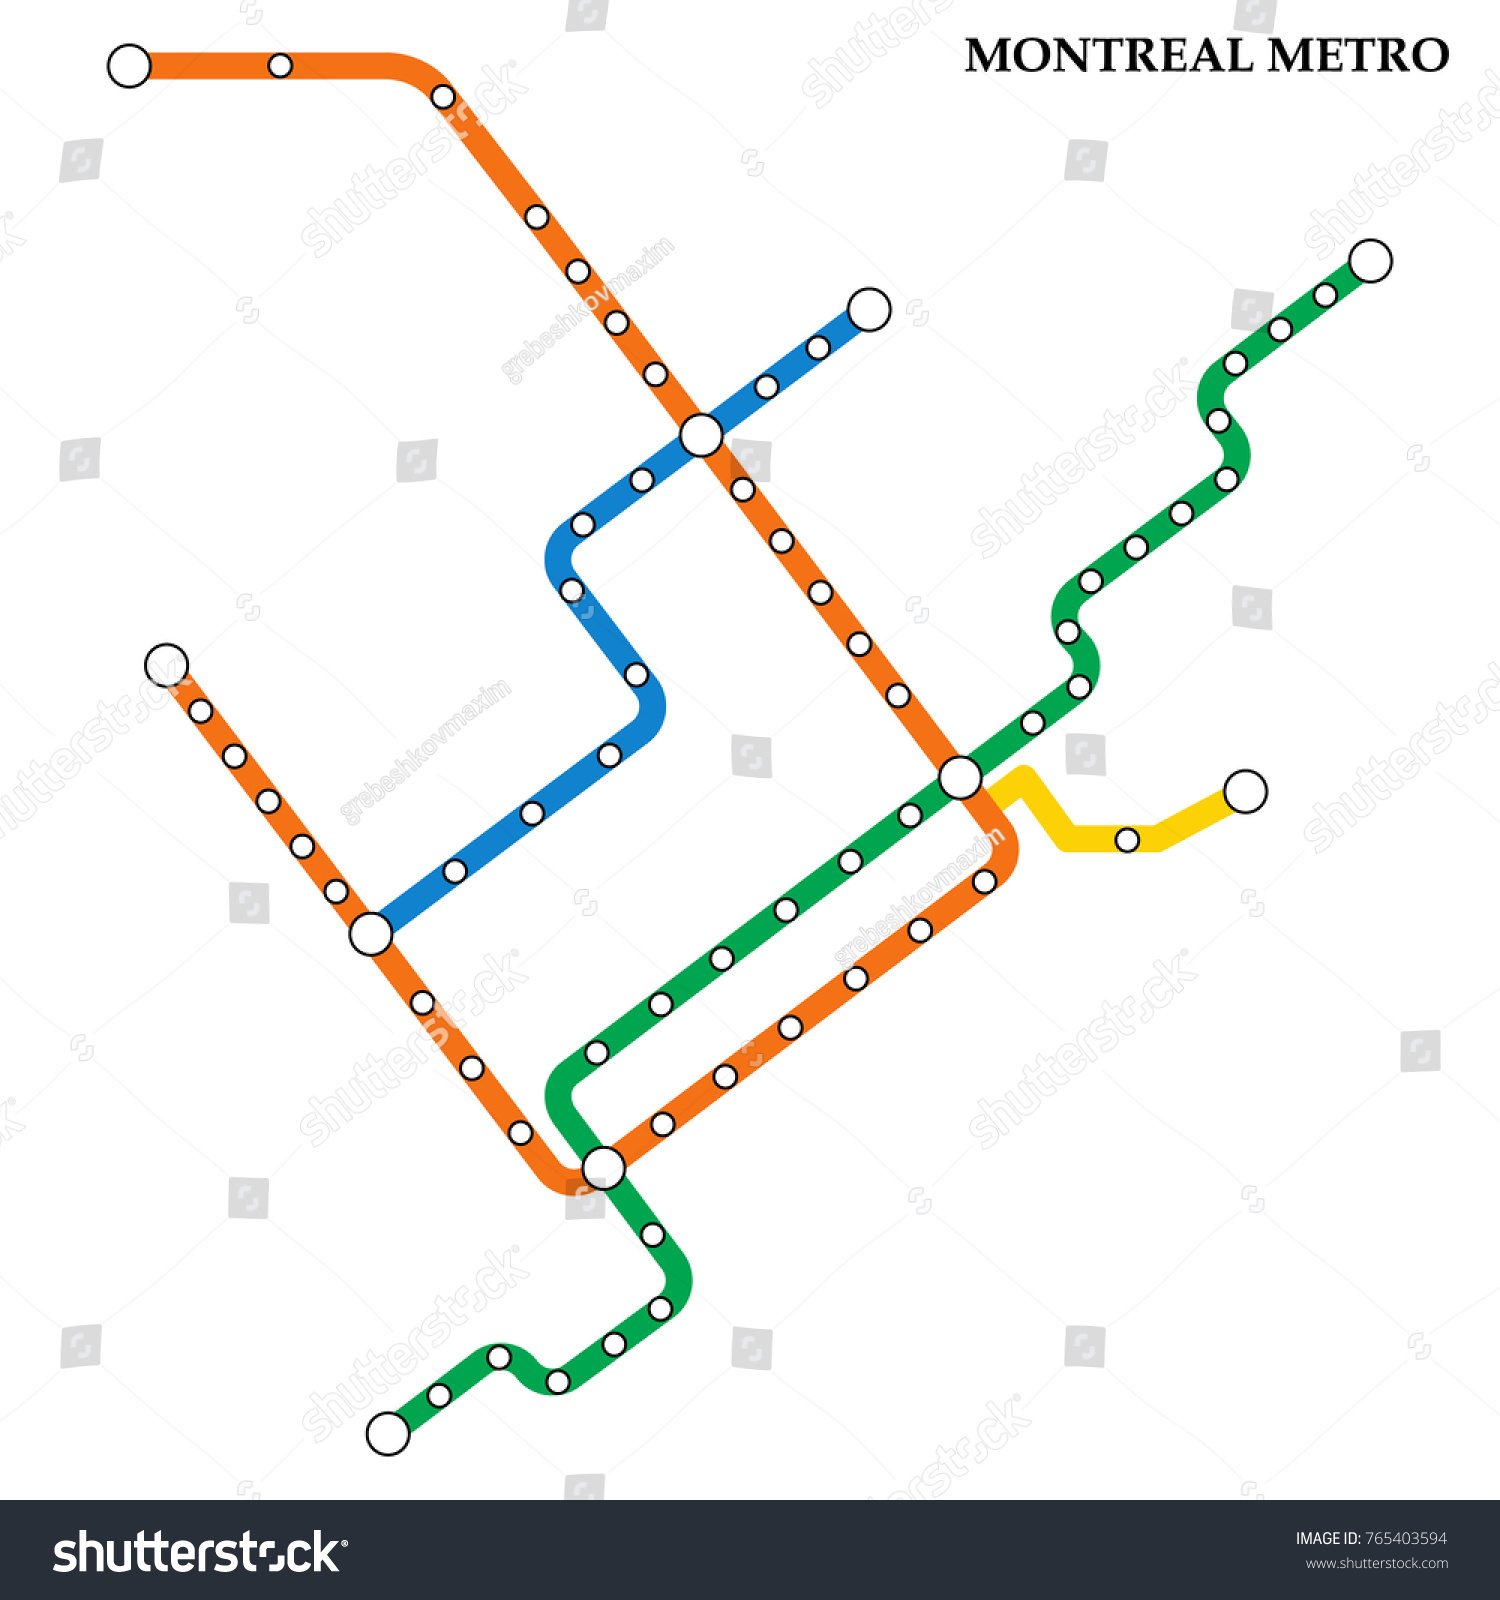 Subway Map Montreal.Map Montreal Metro Subway Template City Stock Vector Royalty Free